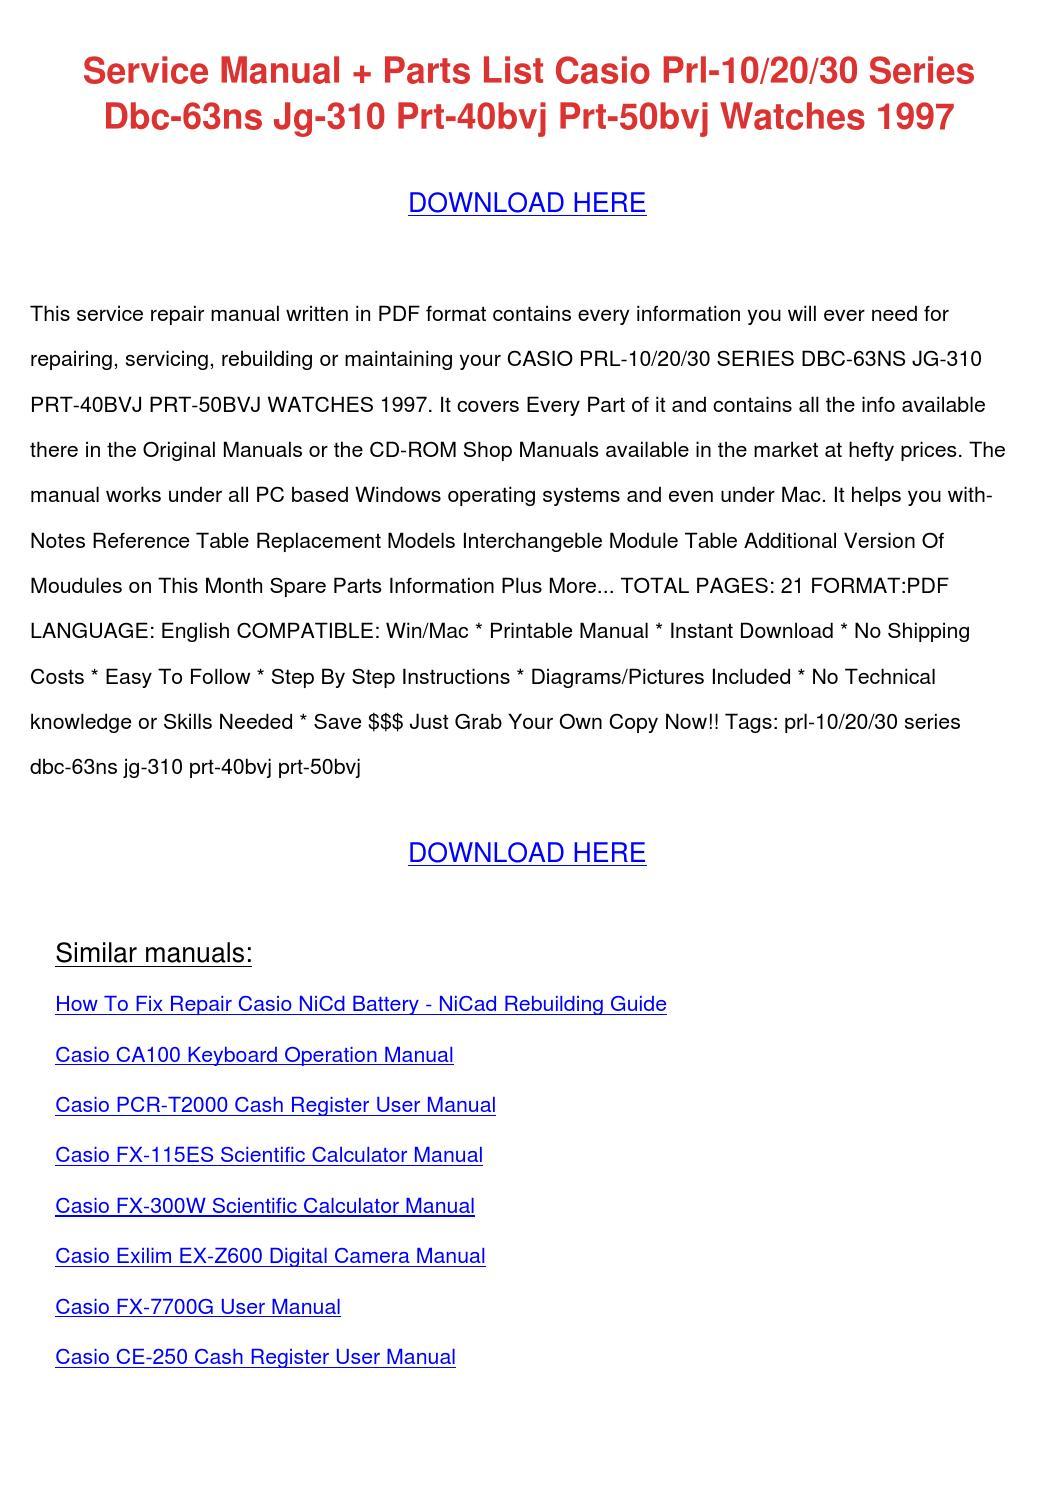 Service Manual Parts List Casio Prl 102030 Se by SeymourSaldivar ...